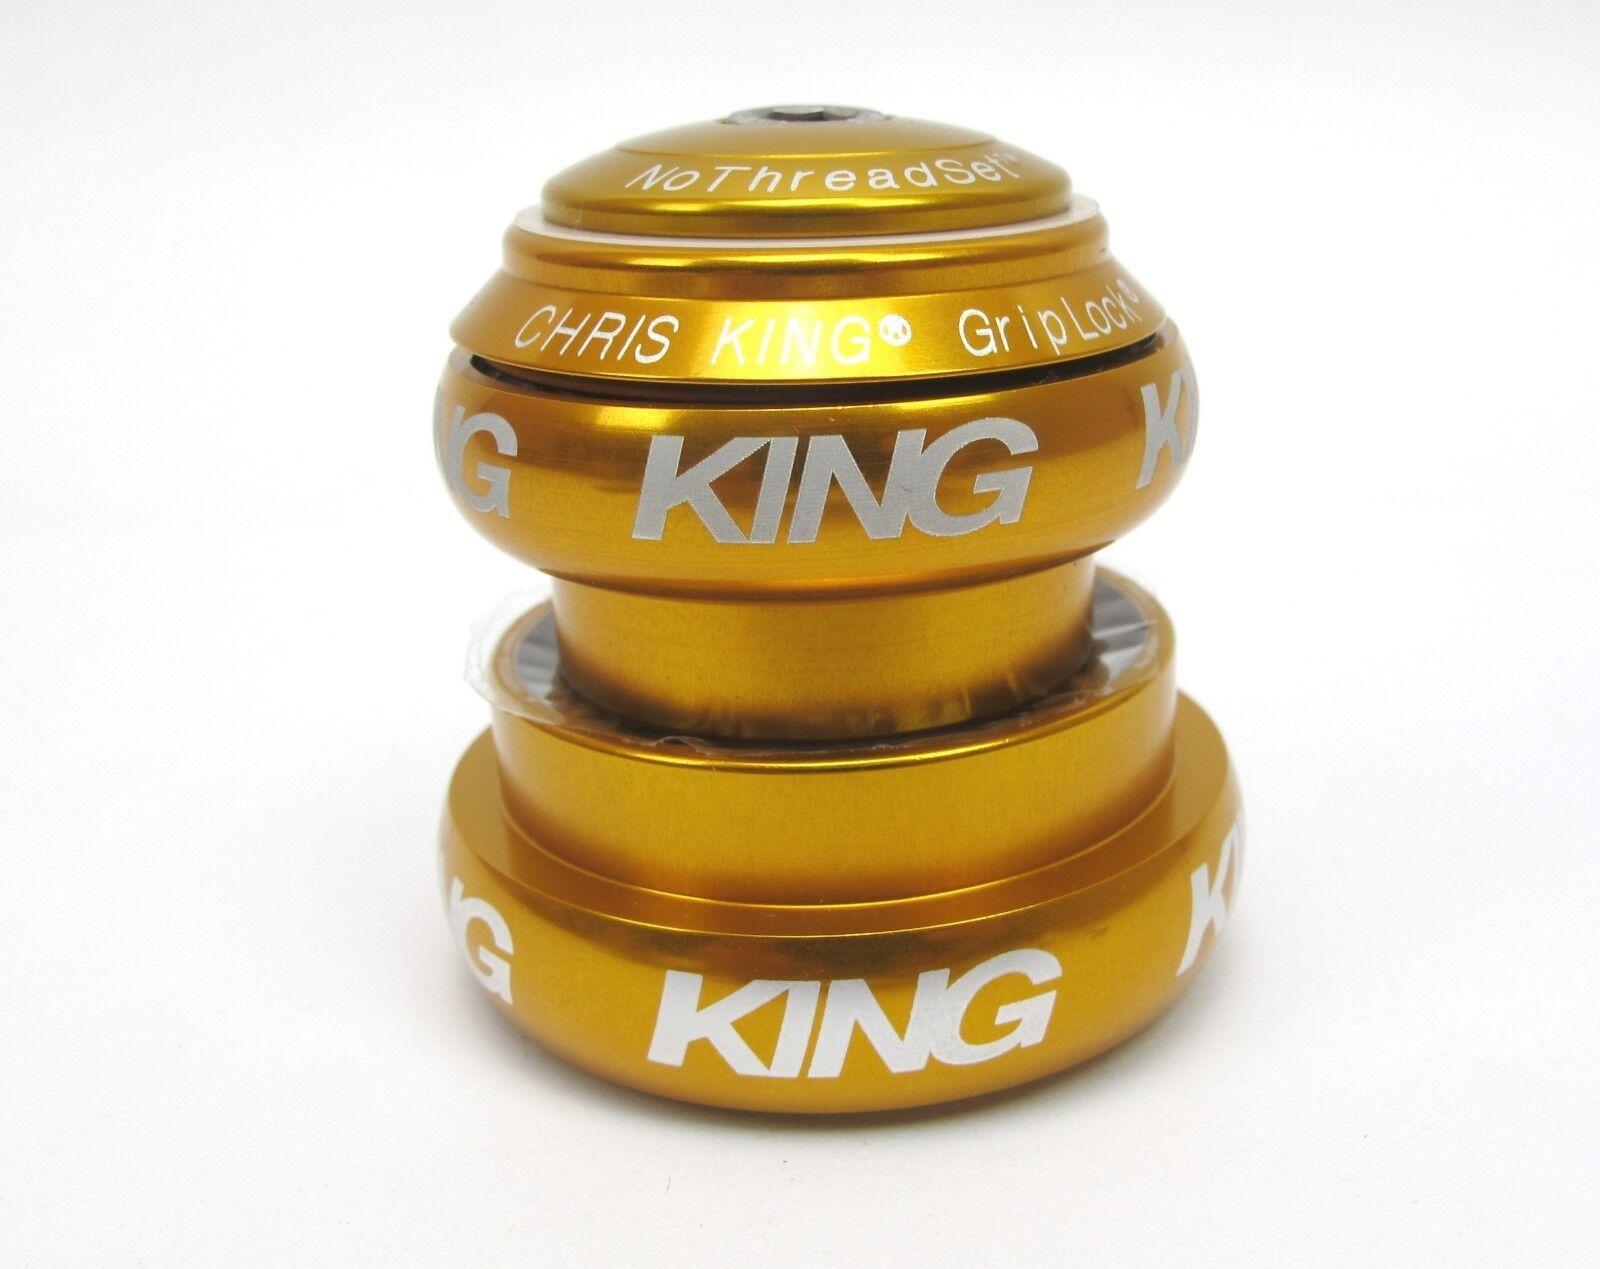 Chris King nothreadset  Auriculares 1 1 4  Cónico EC34 EC44 oro - 10 Año De Garantía  últimos estilos